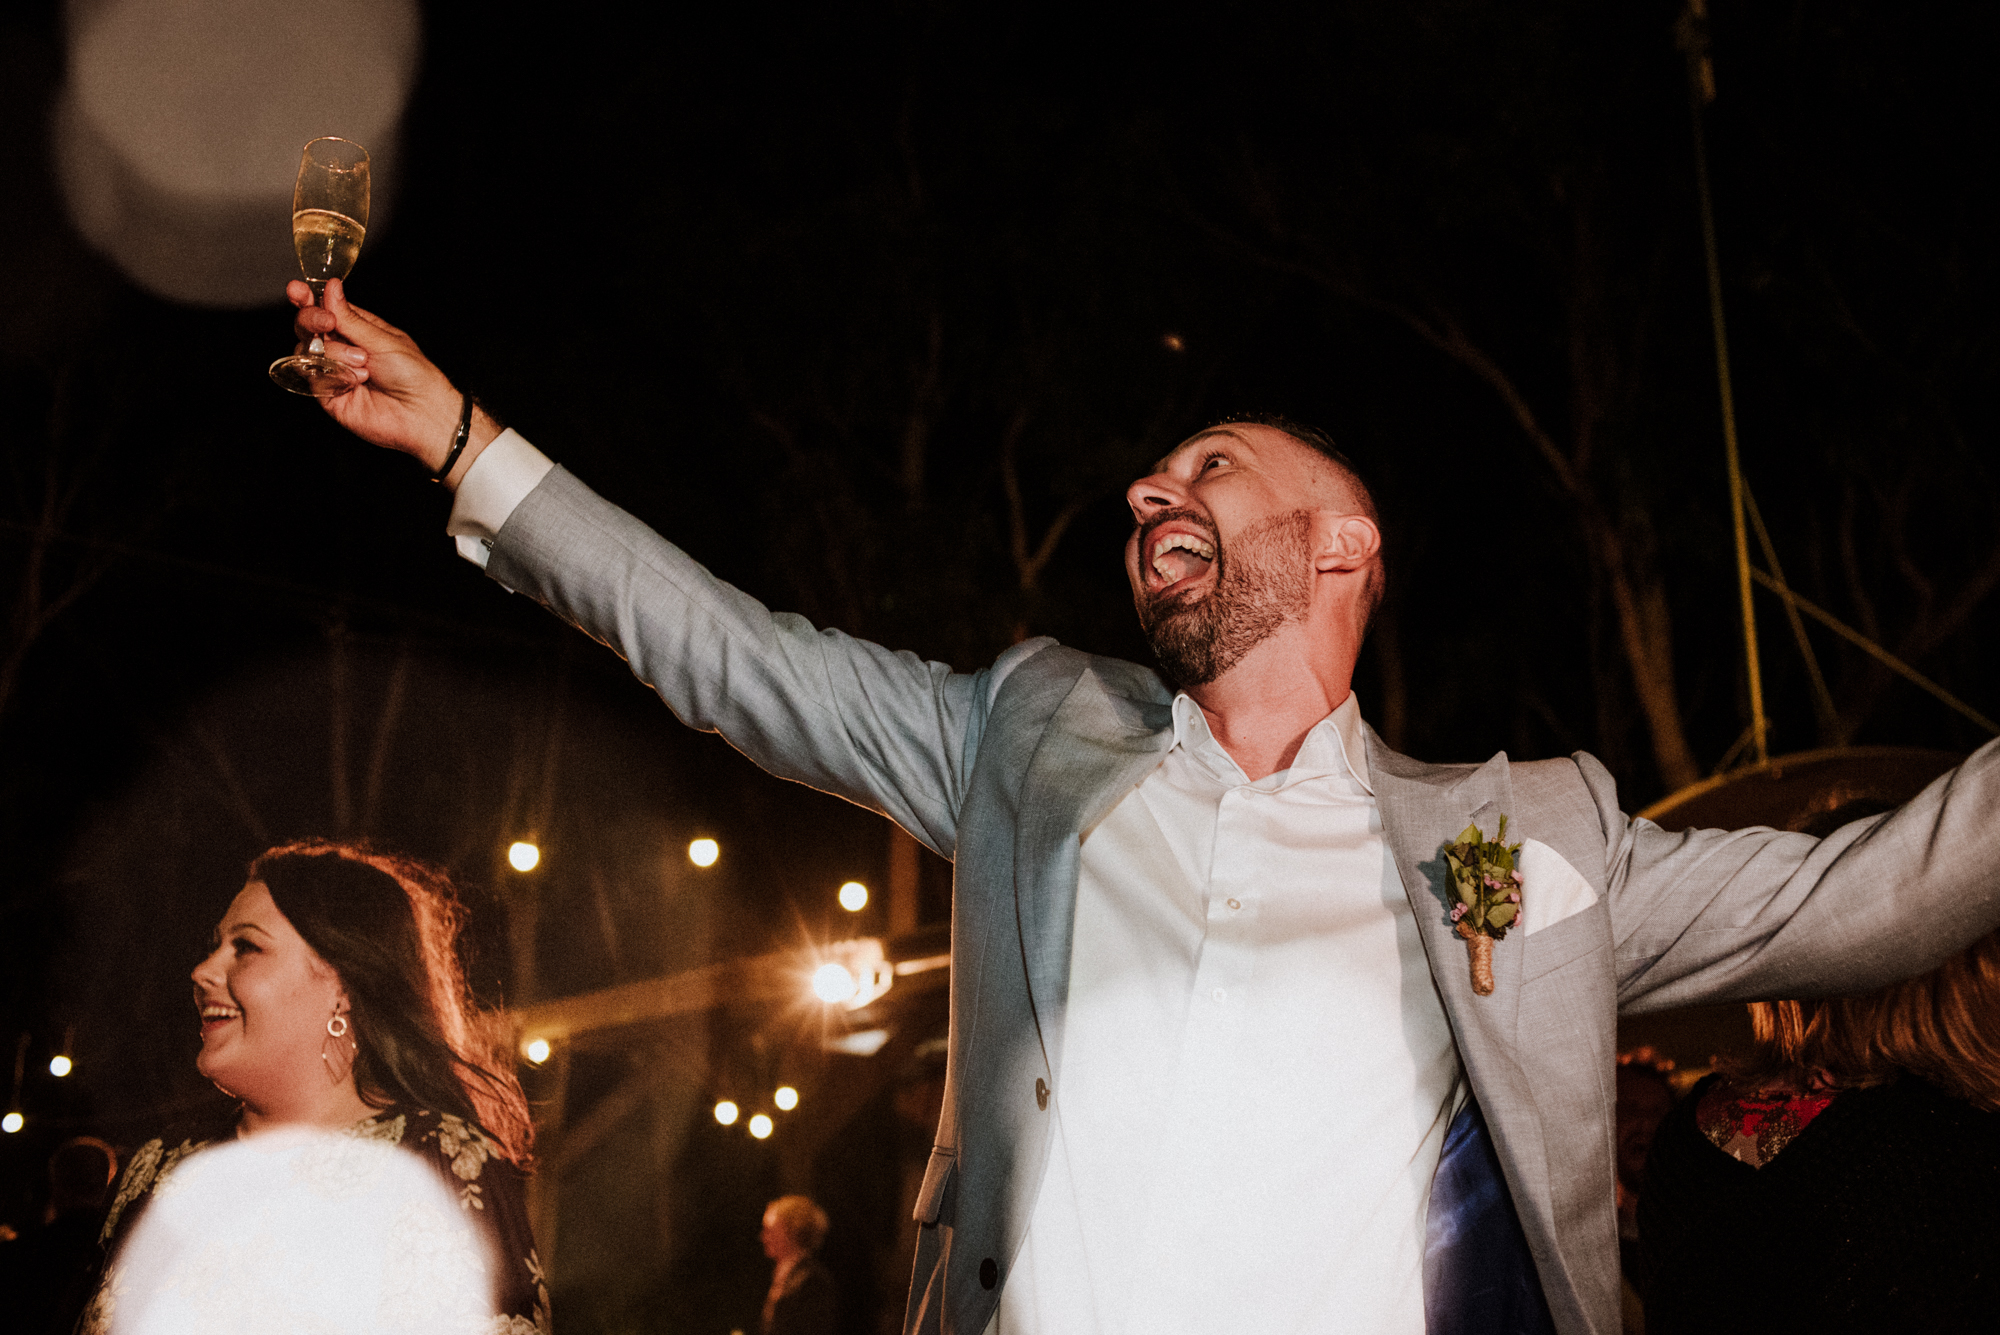 jessica-howard-photography-sean-alessandro-wedding-day-web-560.jpg